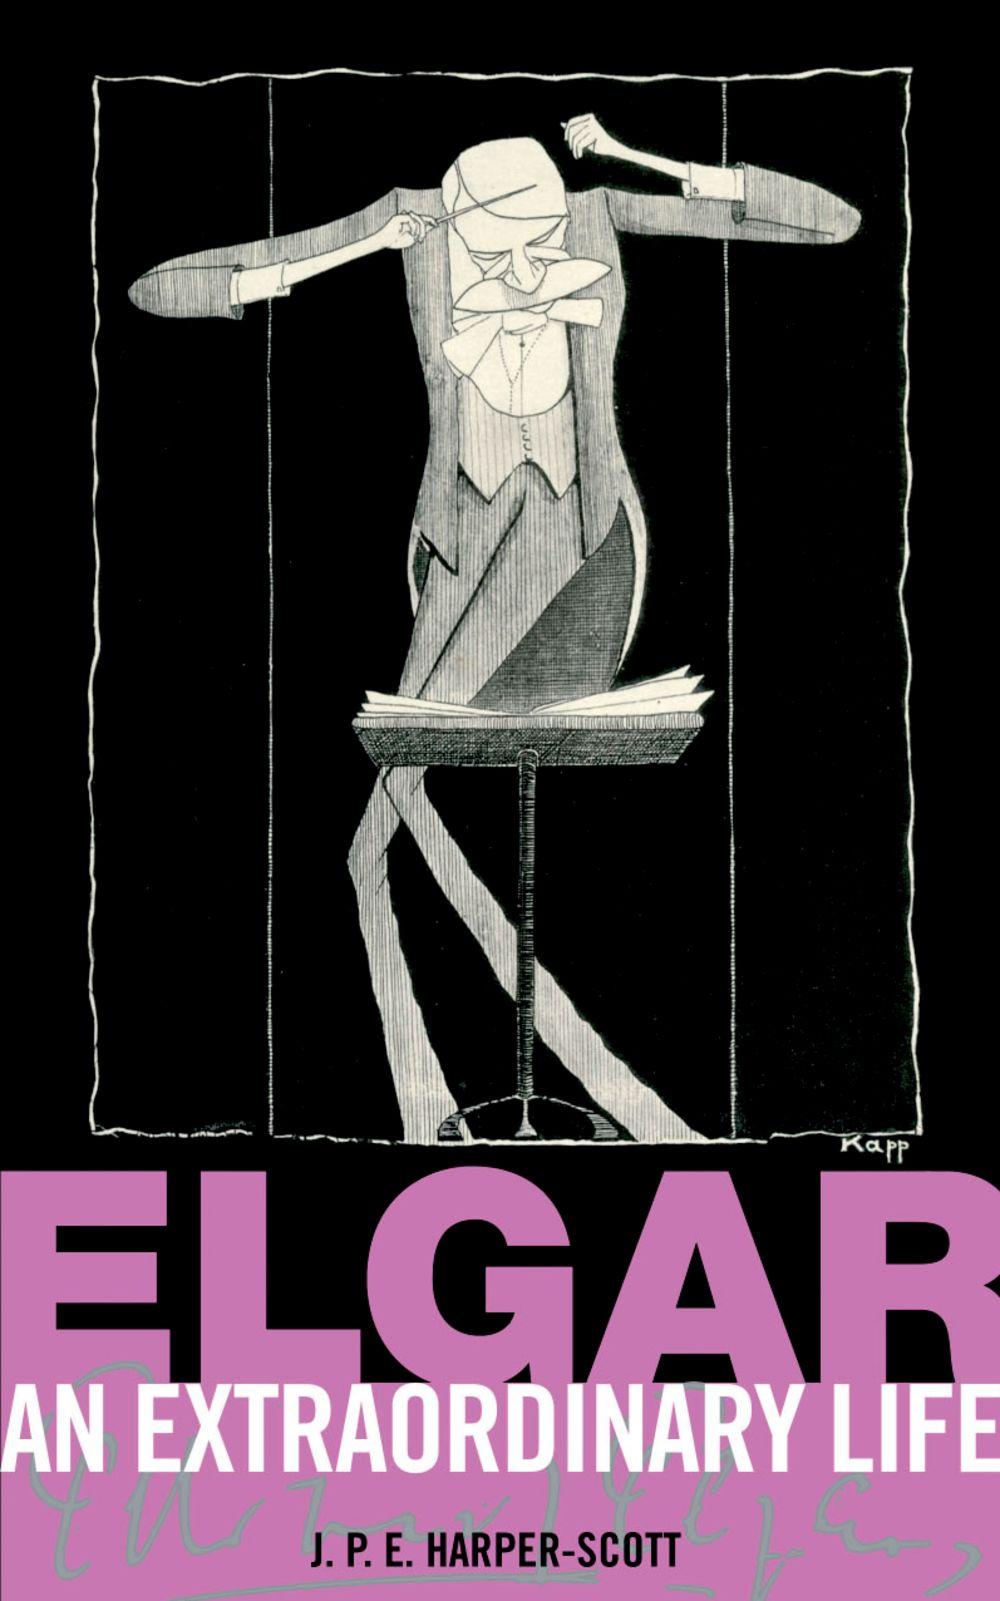 JPE Harper-Scott: Elgar: An Extraordinary Life: Biography